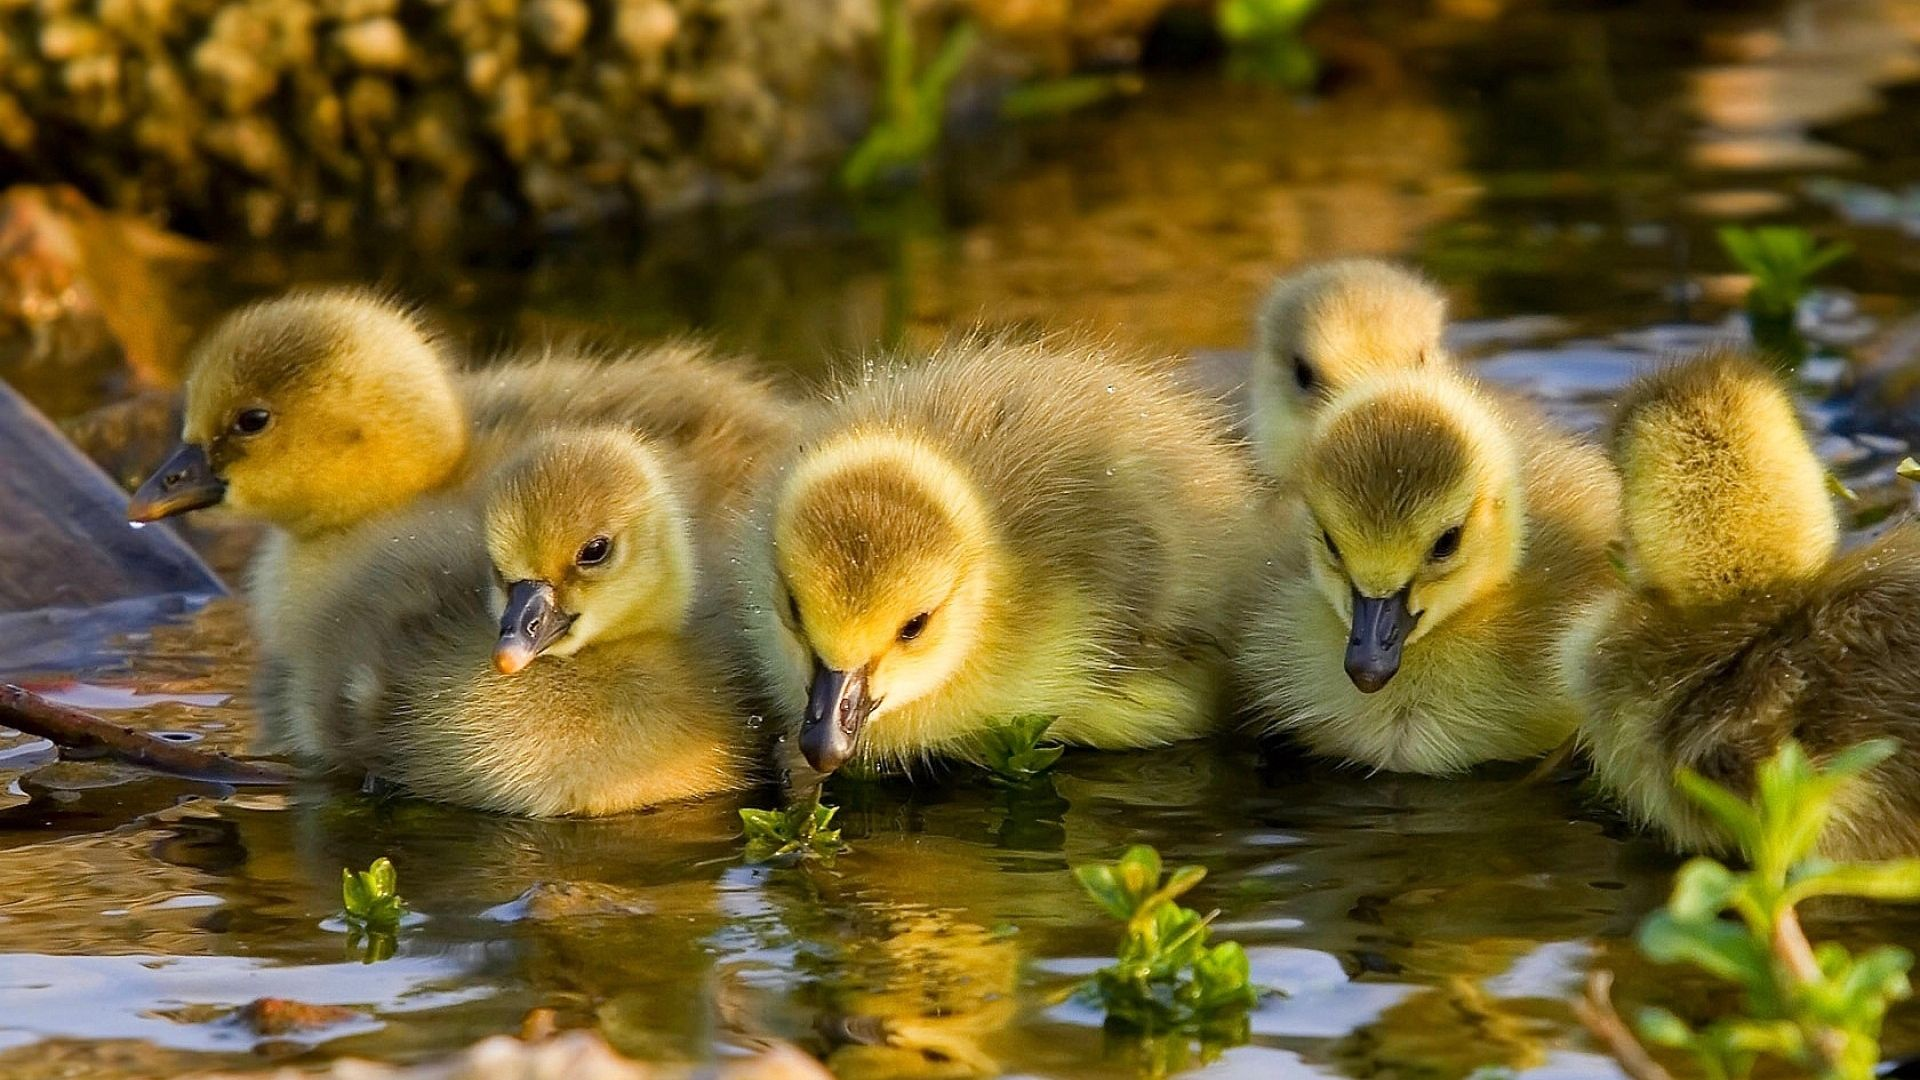 Ducklings And Goslings Photo